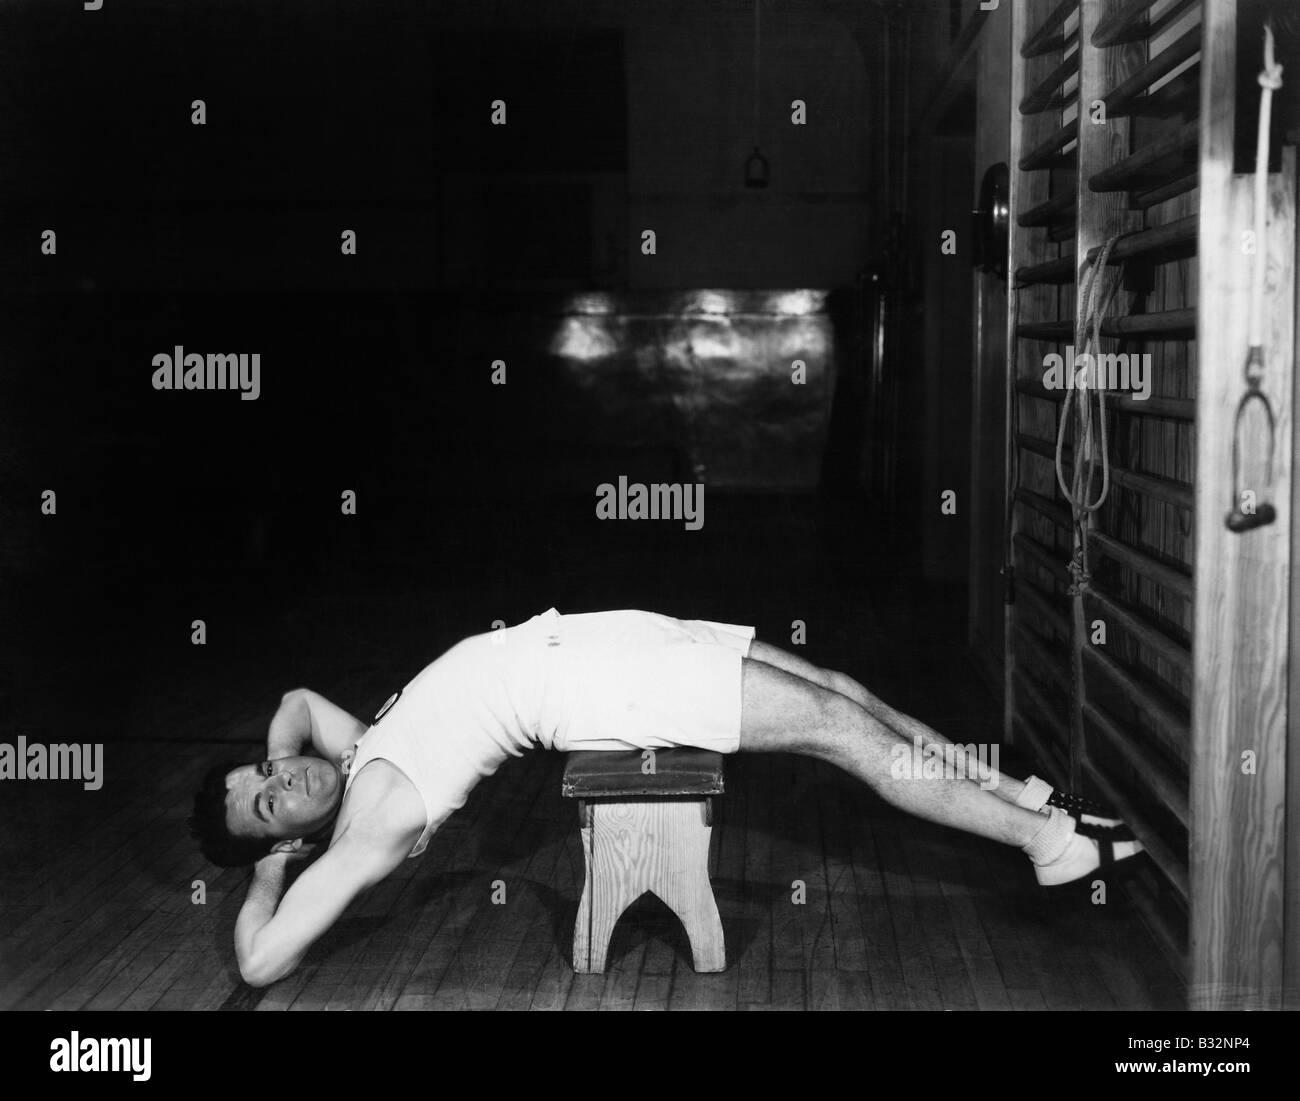 Man exercising on bench - Stock Image